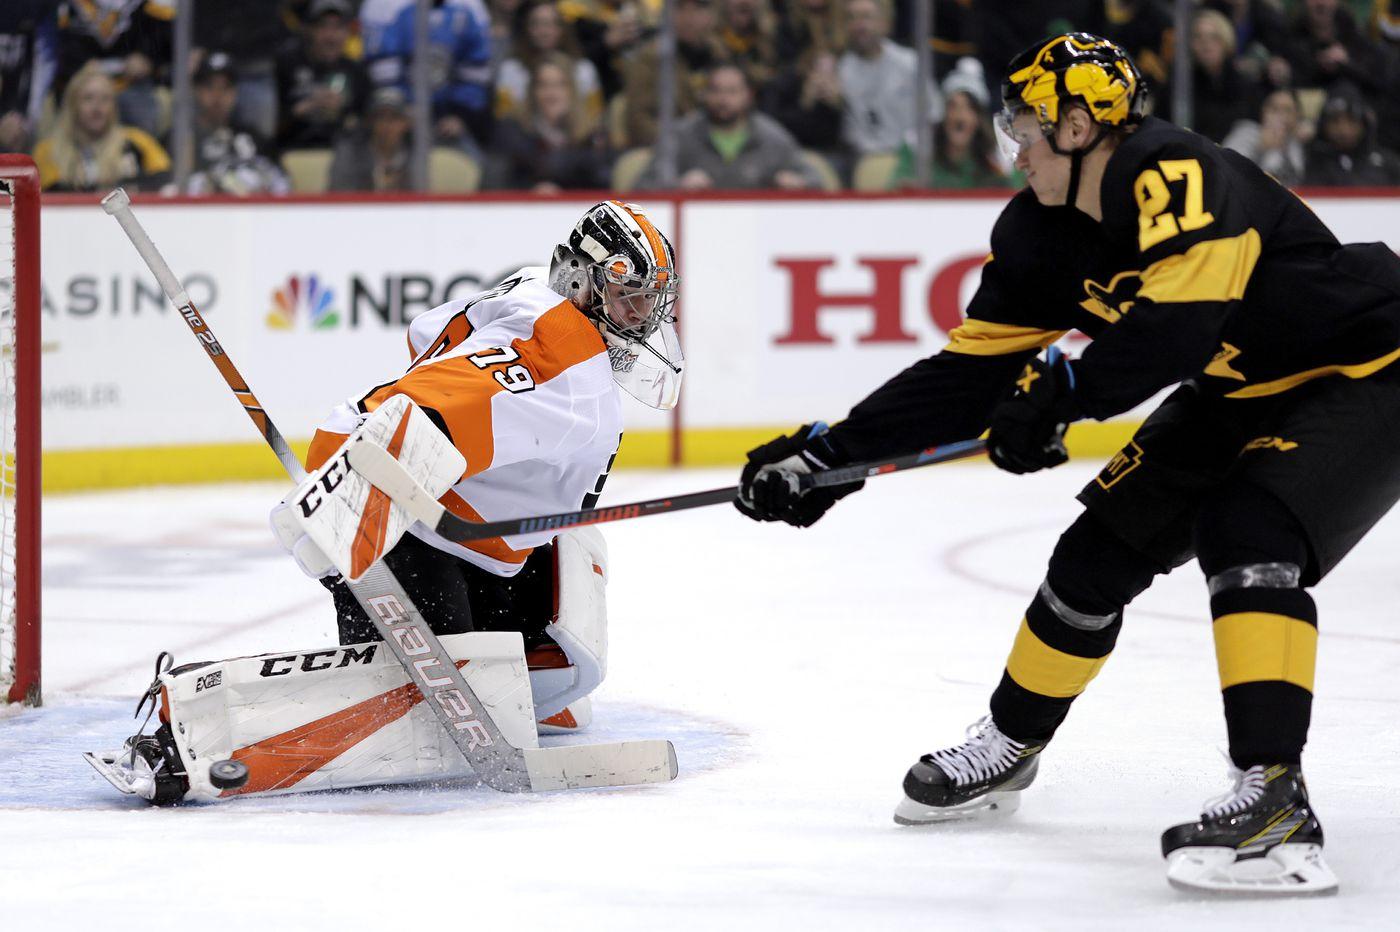 Flyers stun Penguins behind Sean Couturier's late overtime goal, Carter Hart's brilliant goaltending